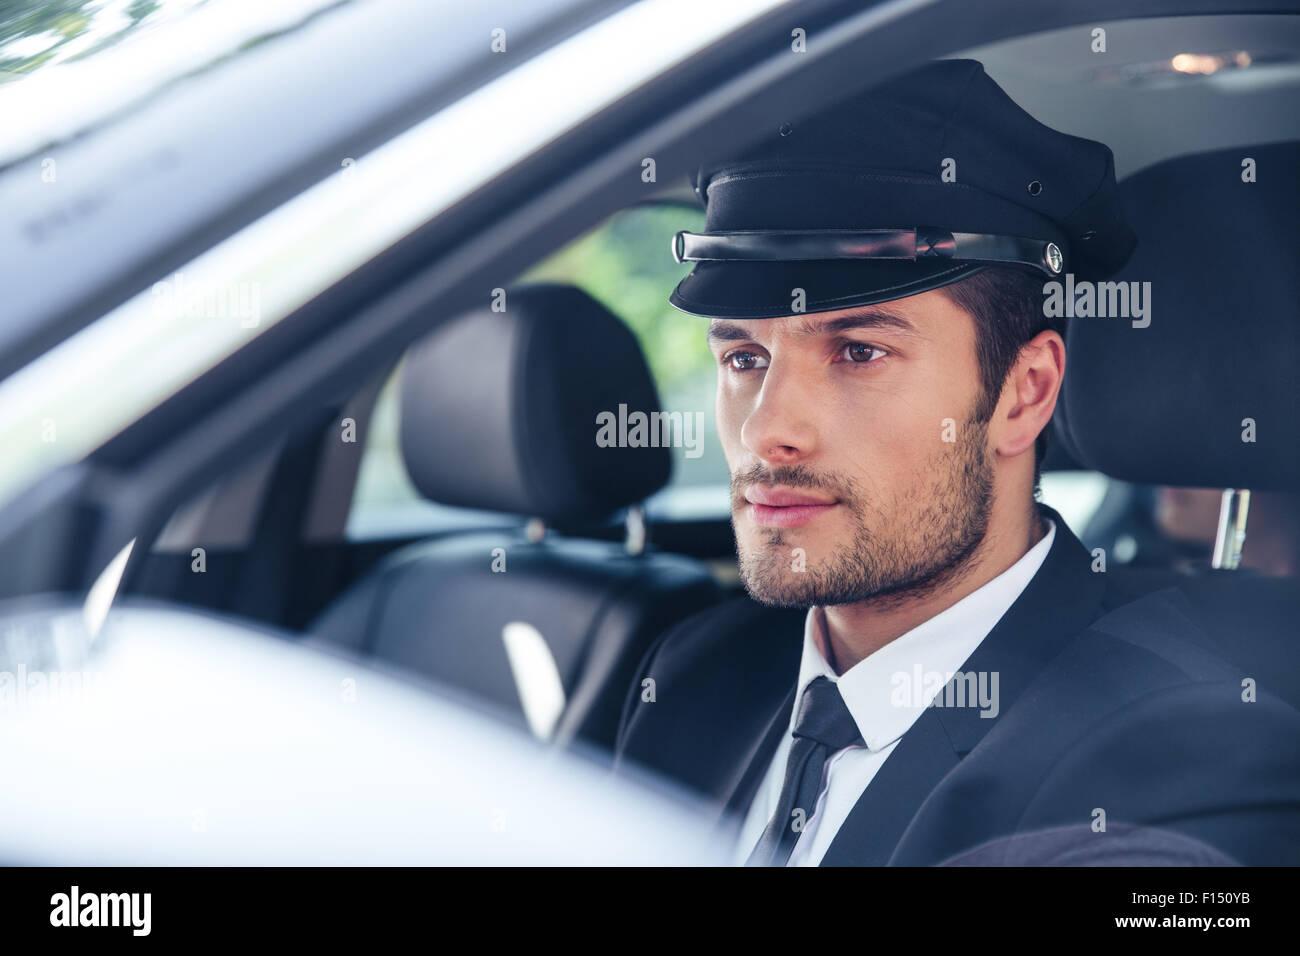 Retrato de un macho guapo sentarse en un coche con chofer Imagen De Stock